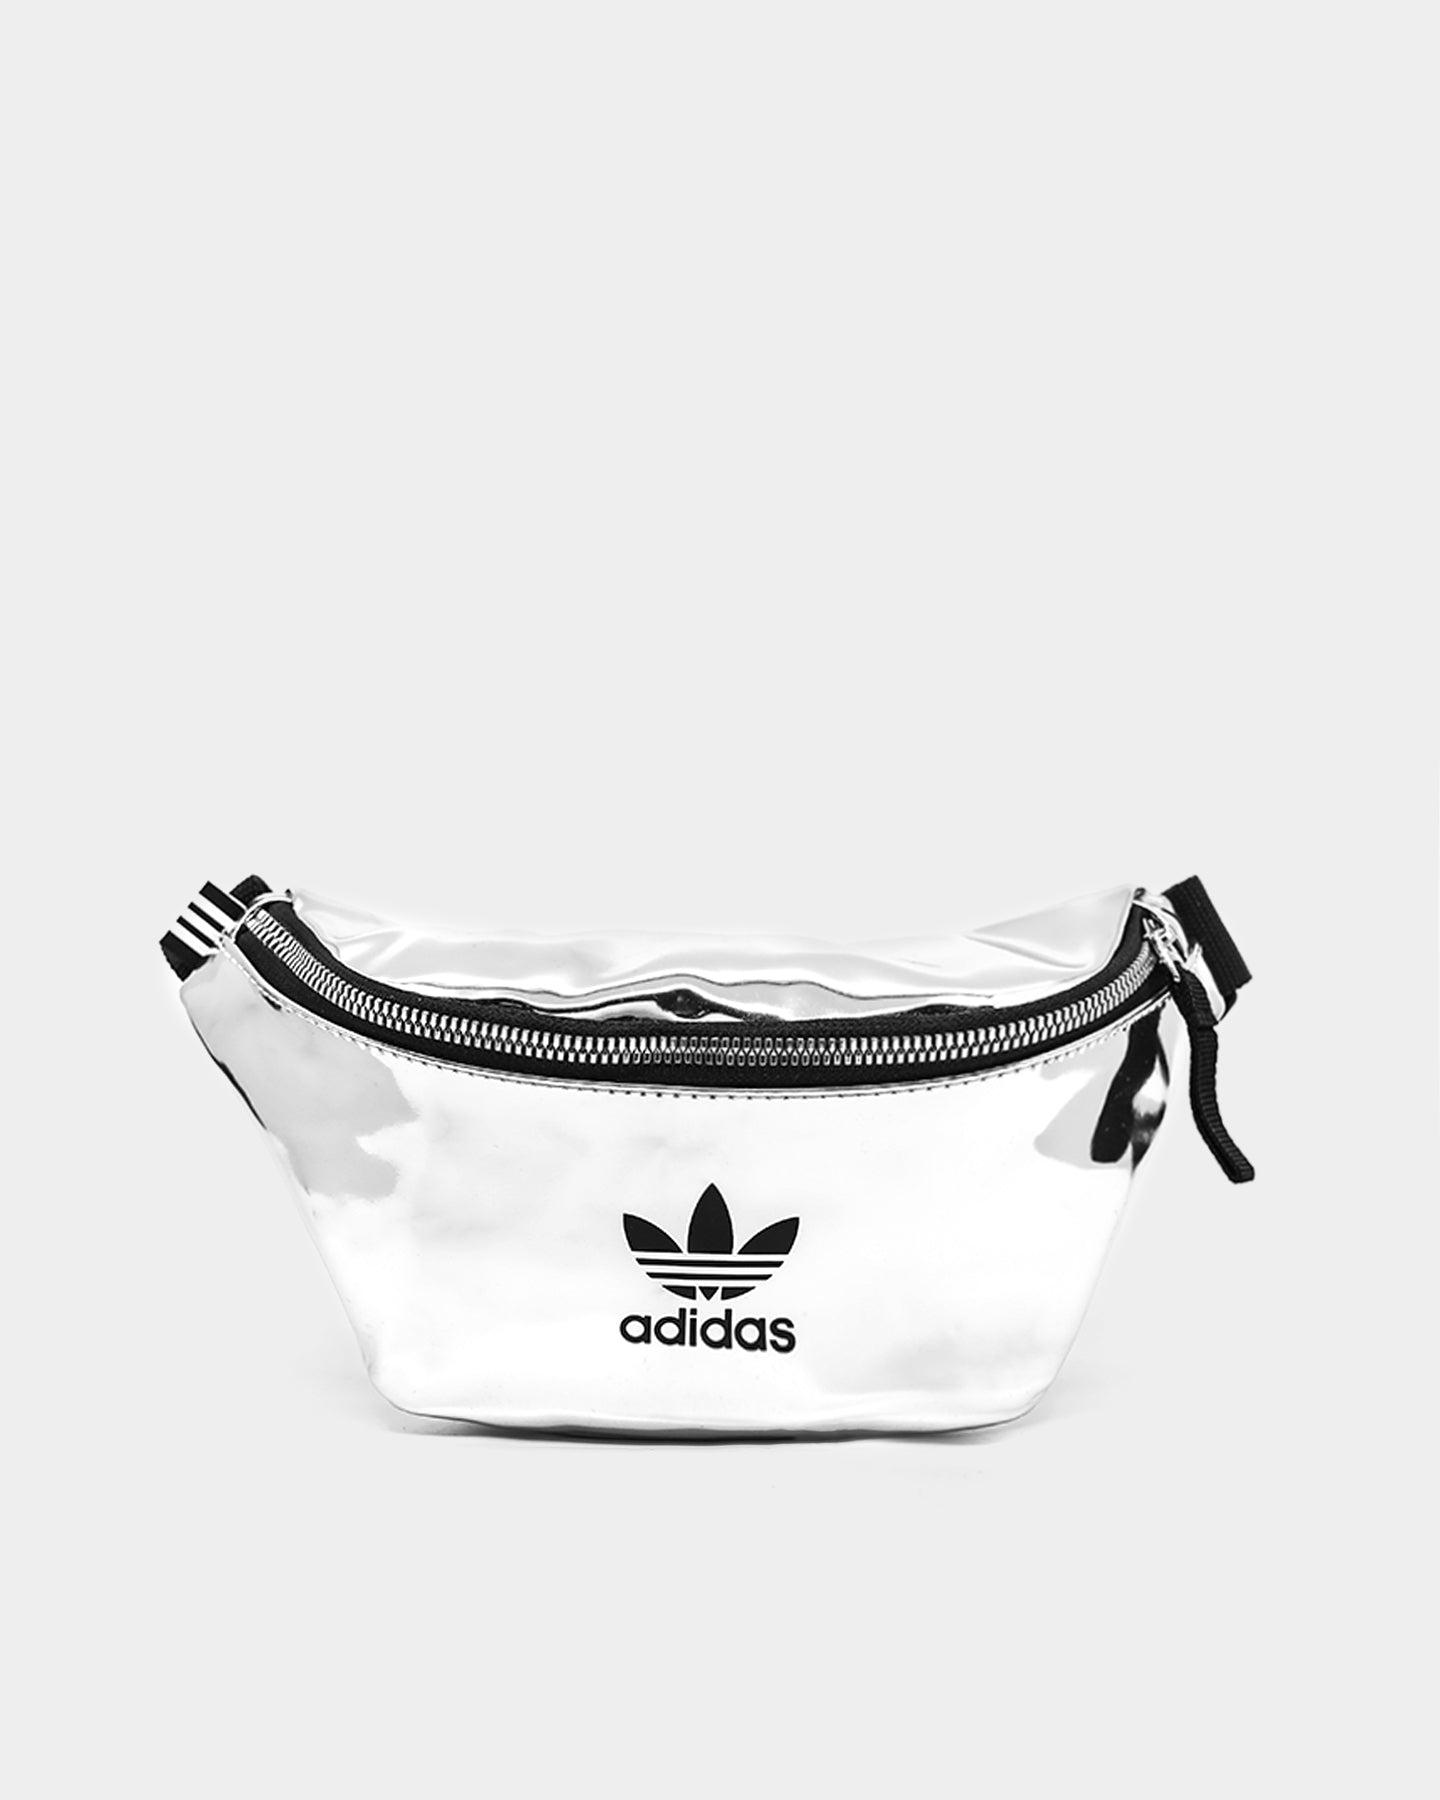 Adidas Xeno Waist Bag Reflective, Men's Fashion, Men's Bags